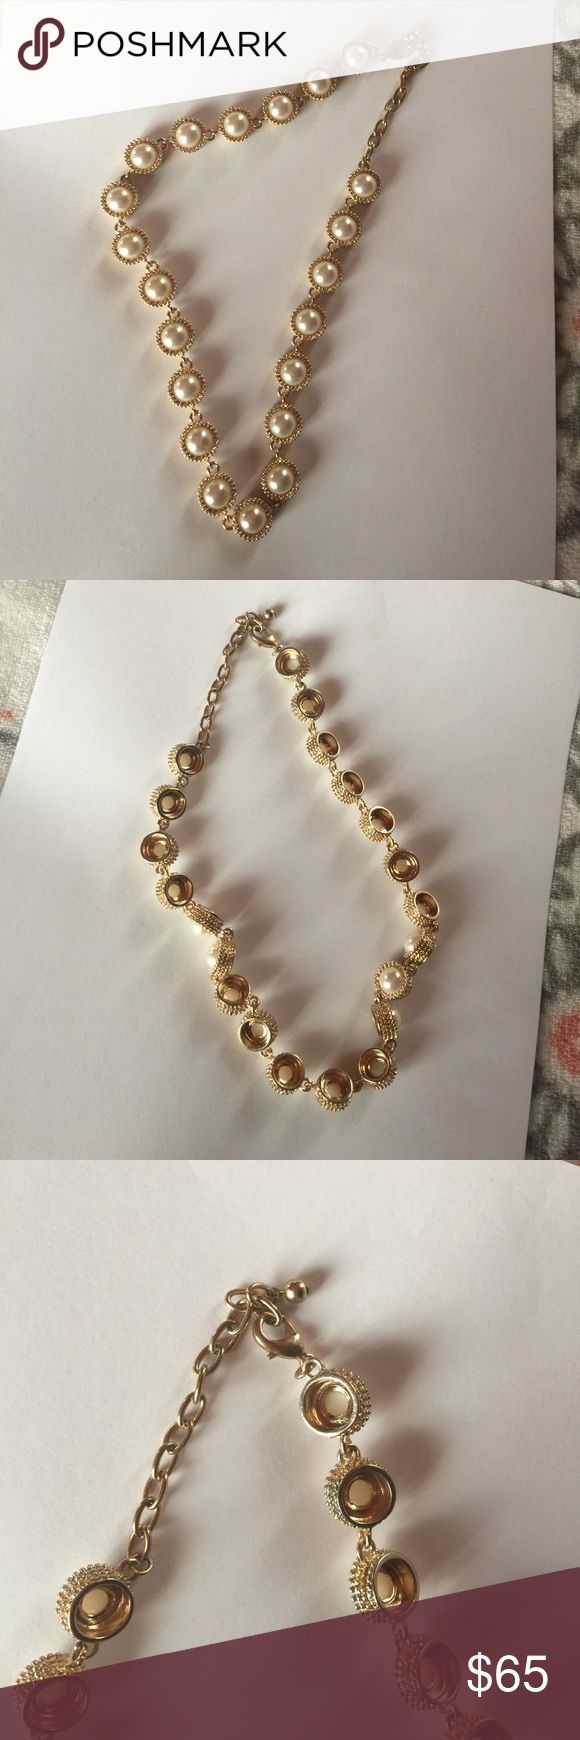 Pandora bracelet dillards - Faux Pearl Necklace From Dillards Nwt